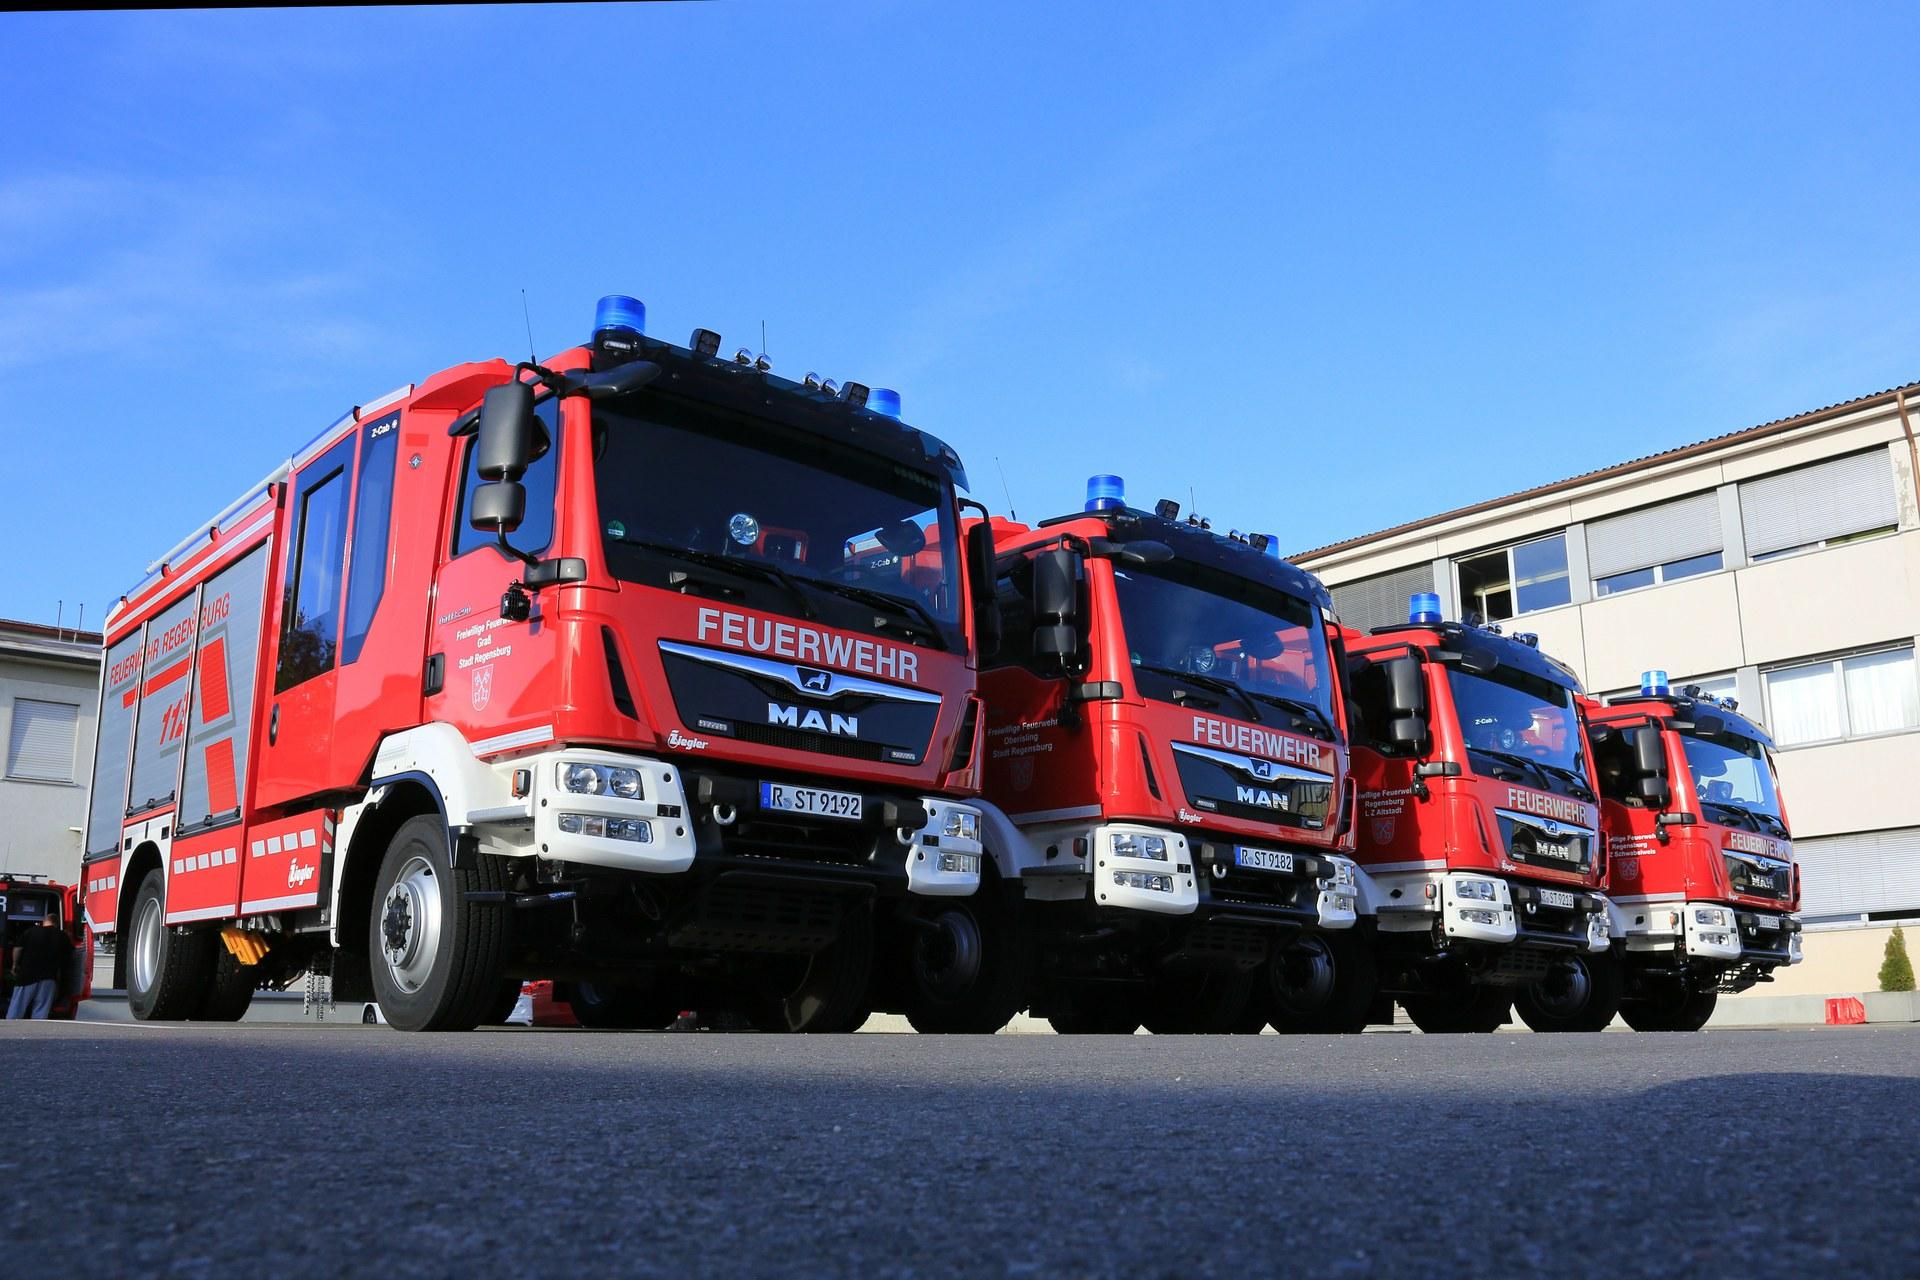 Regensburg Feuerwehr